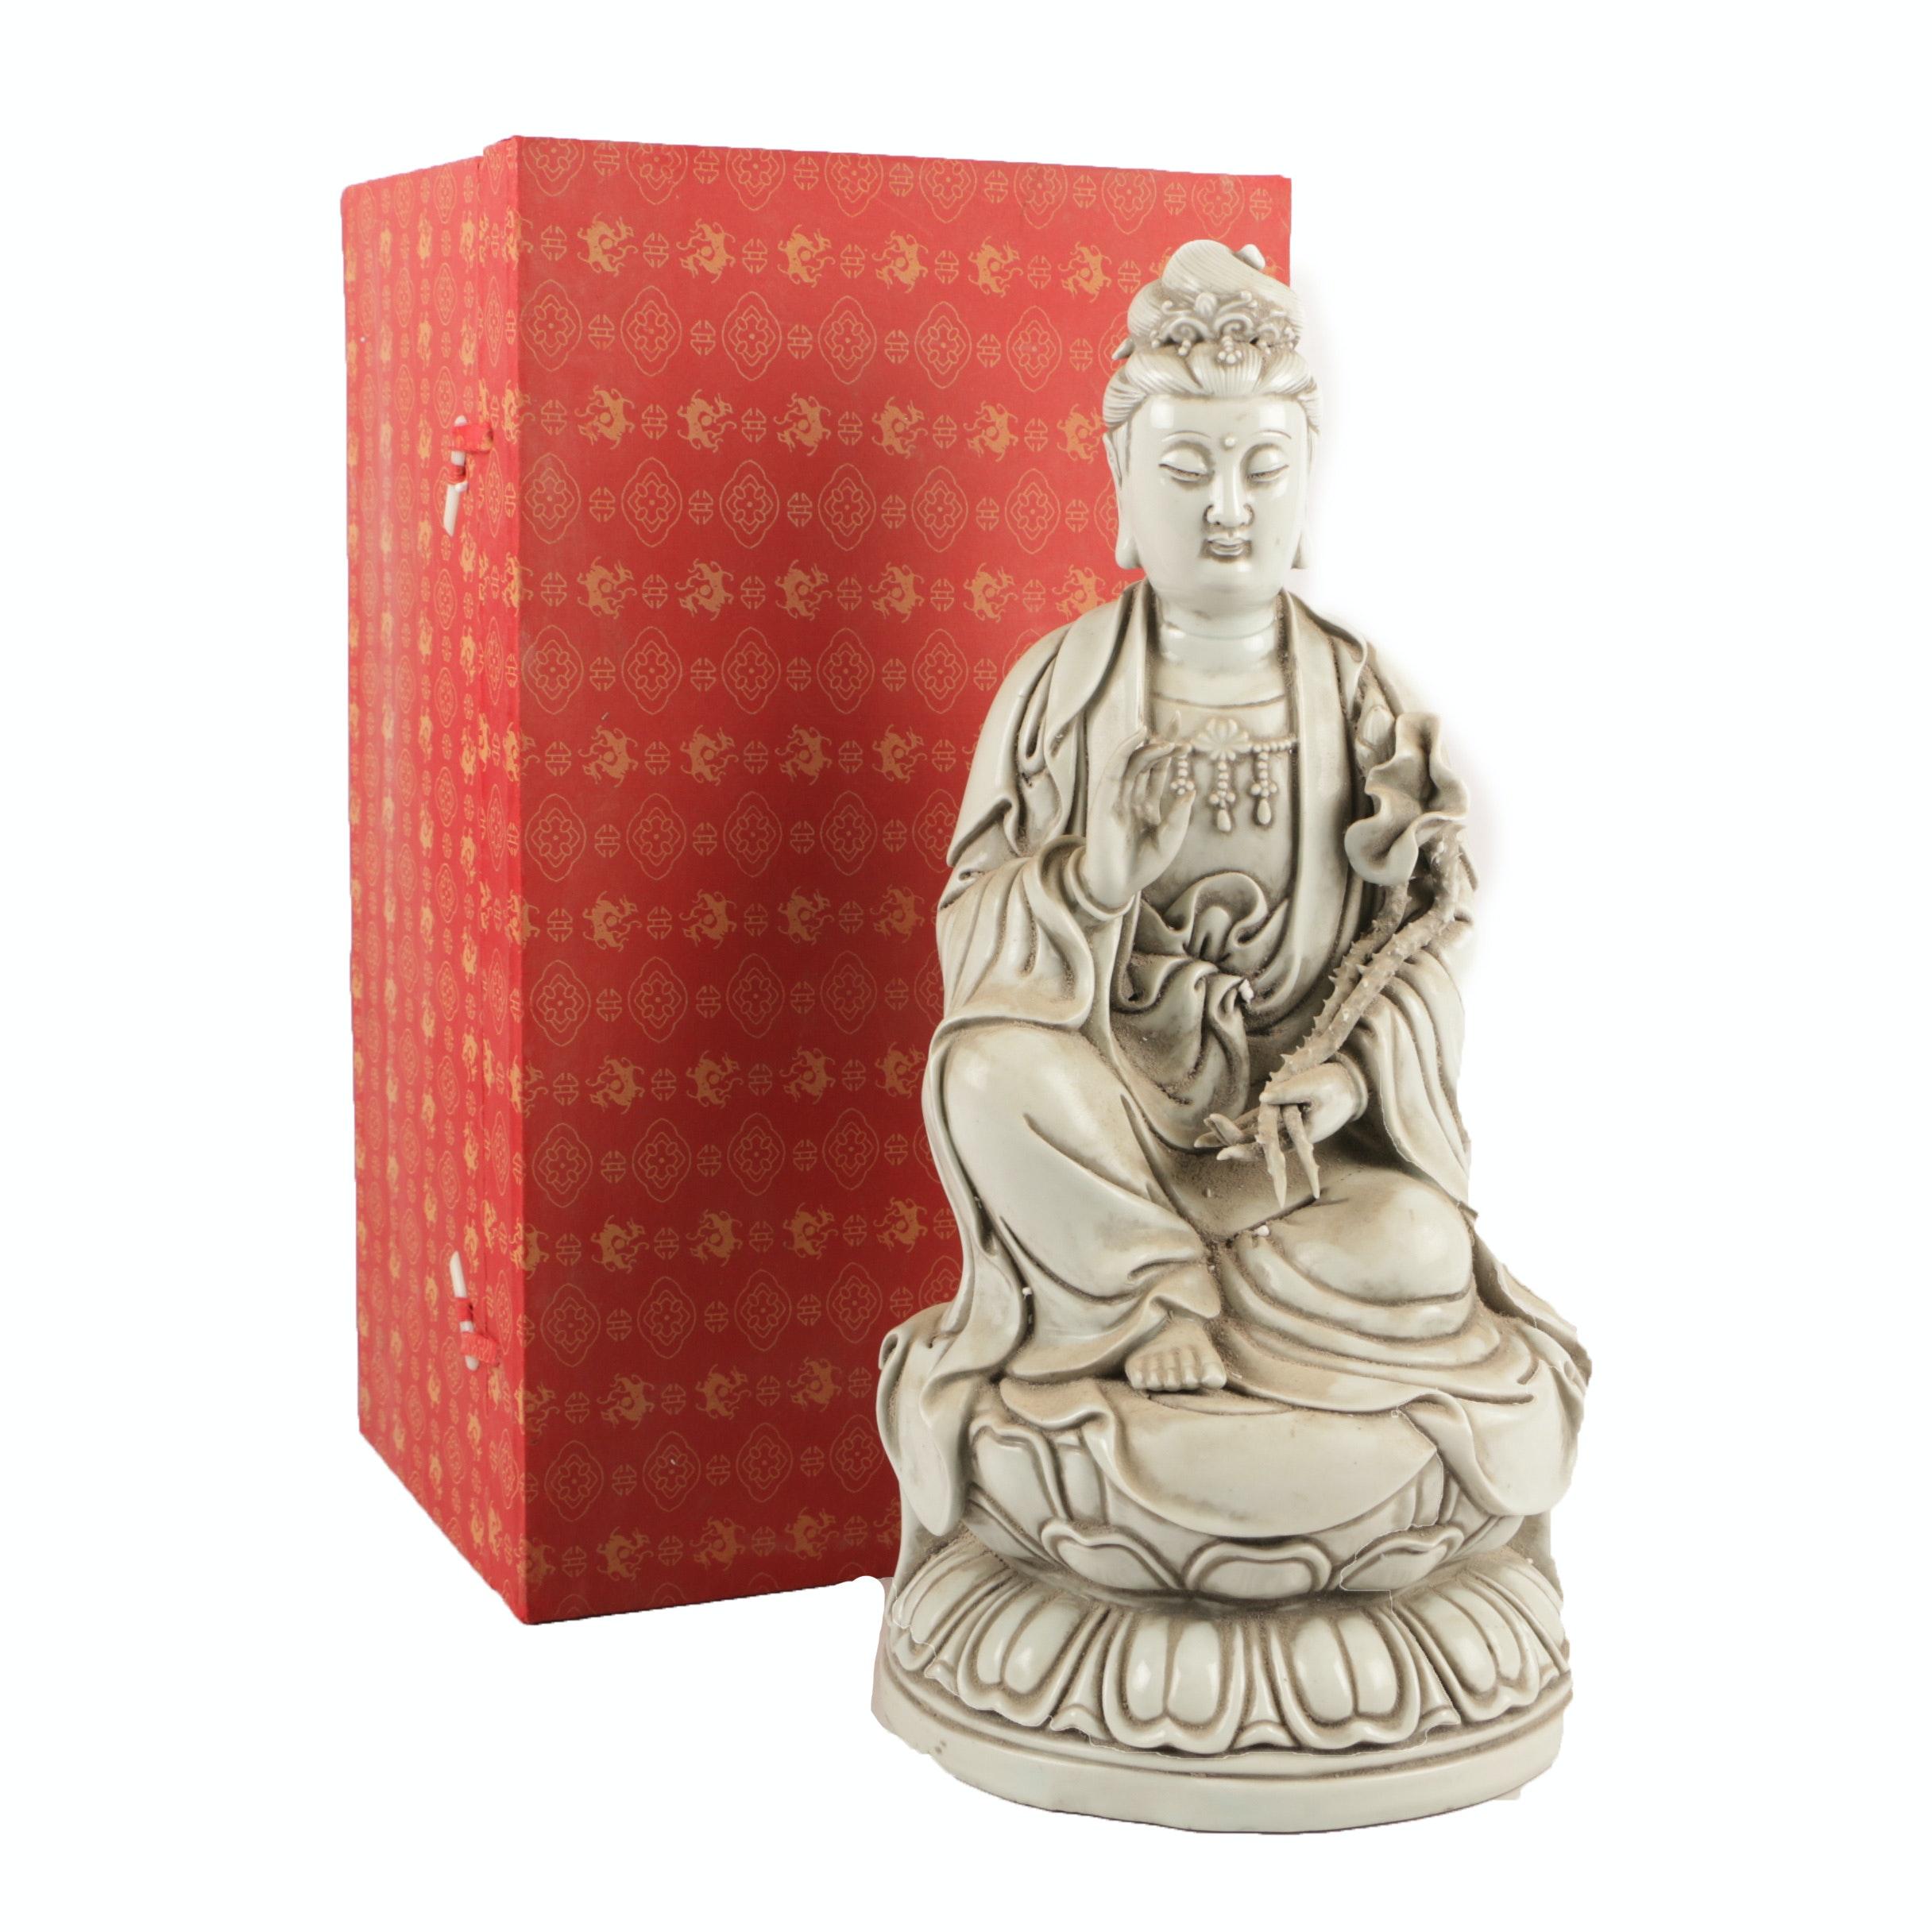 Chinese Seated Guanyin Ceramic Figurine